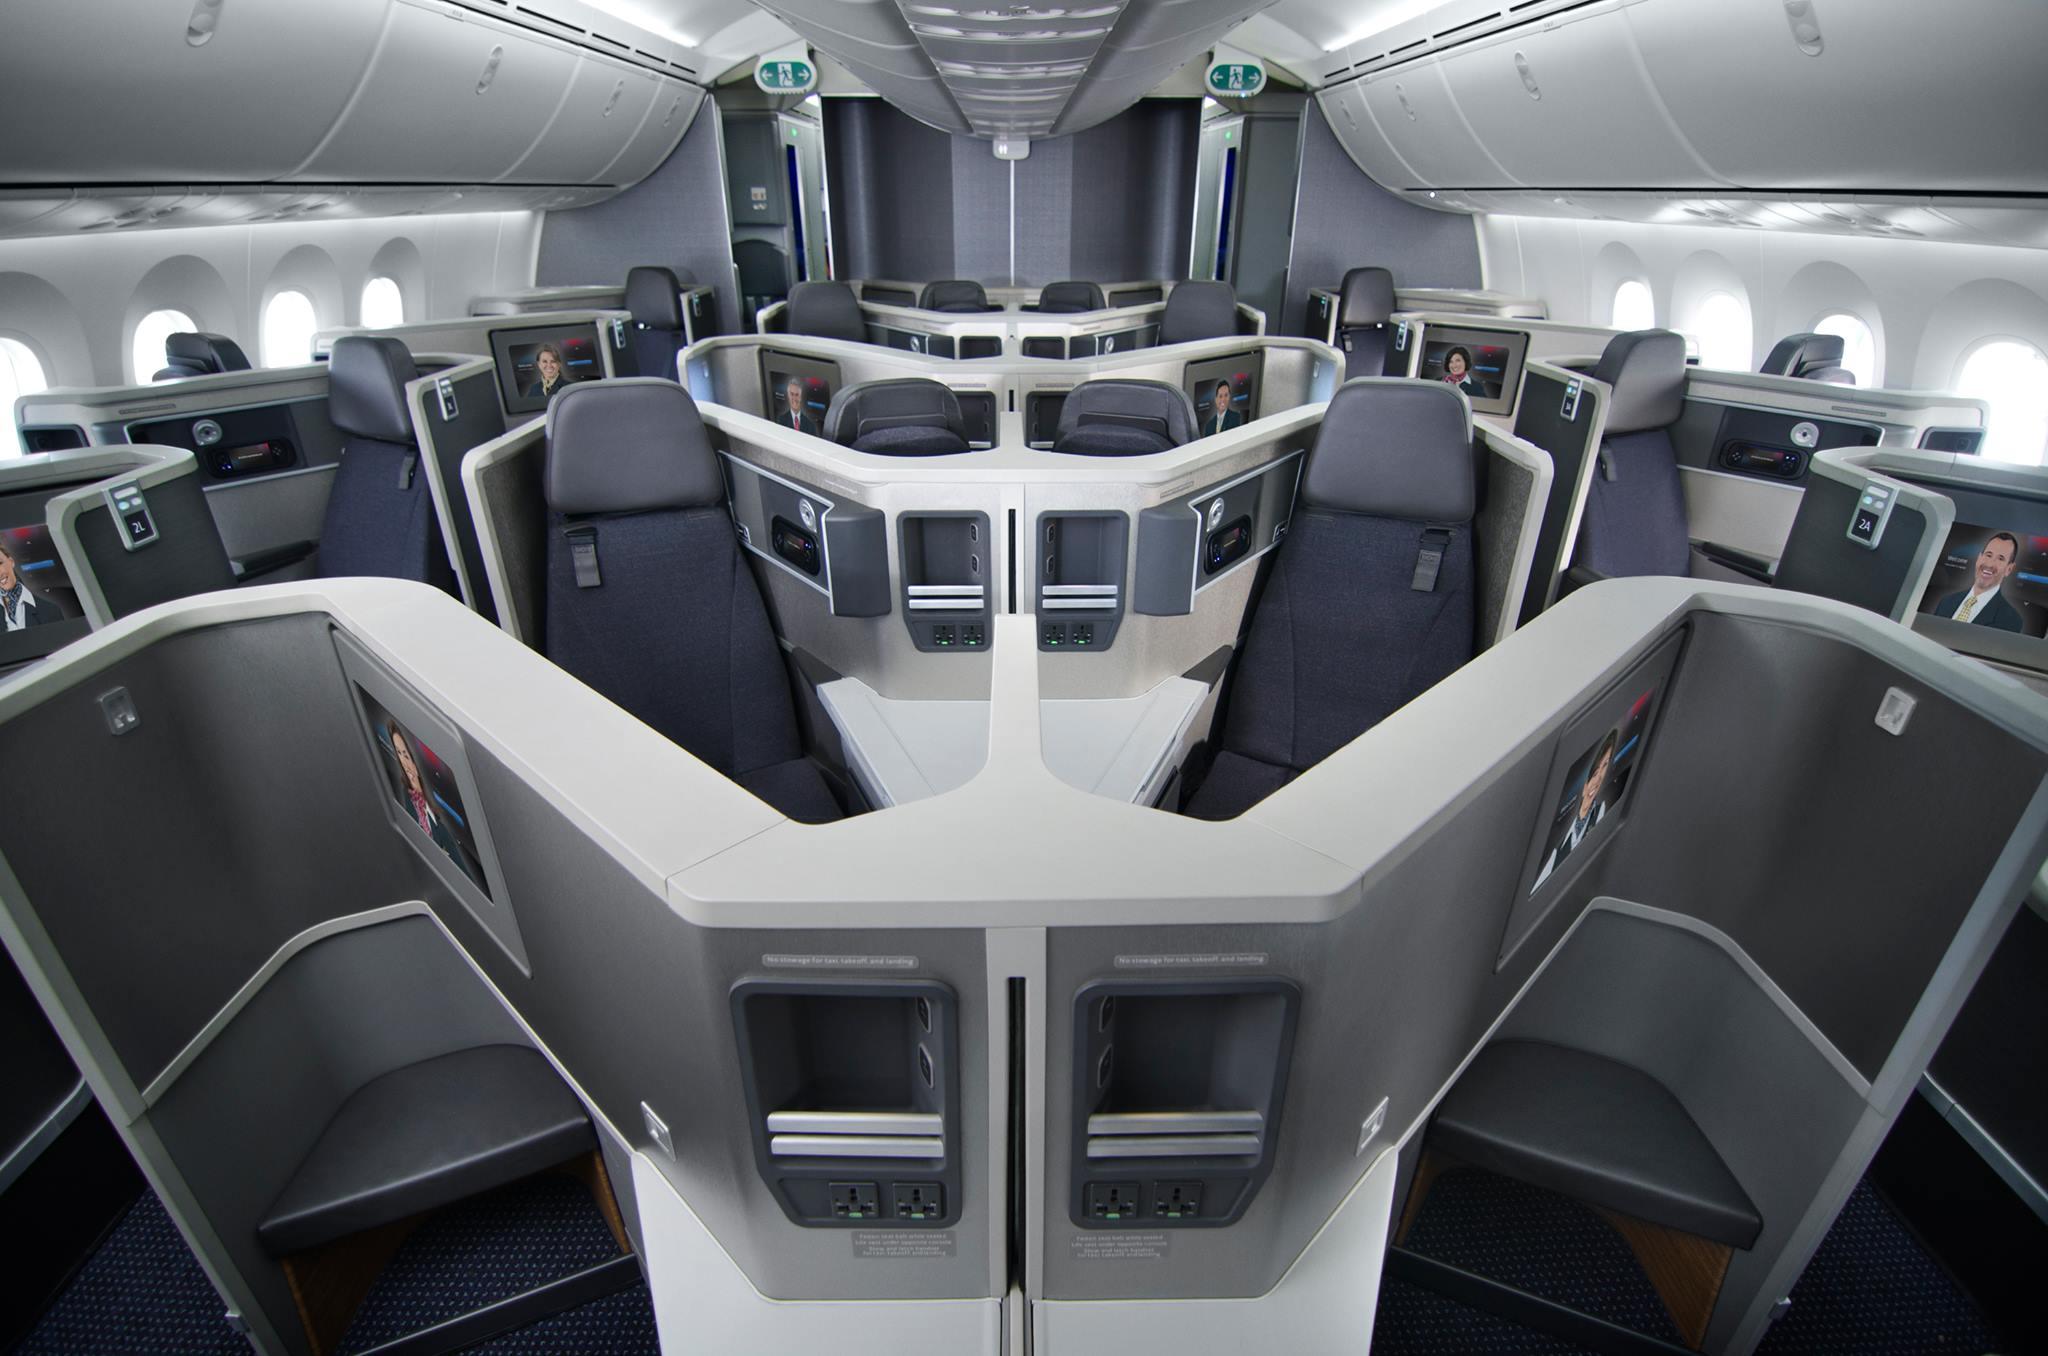 La llegada del nuevo b787 8 de american airlines a ezeiza for Interior 787 avianca